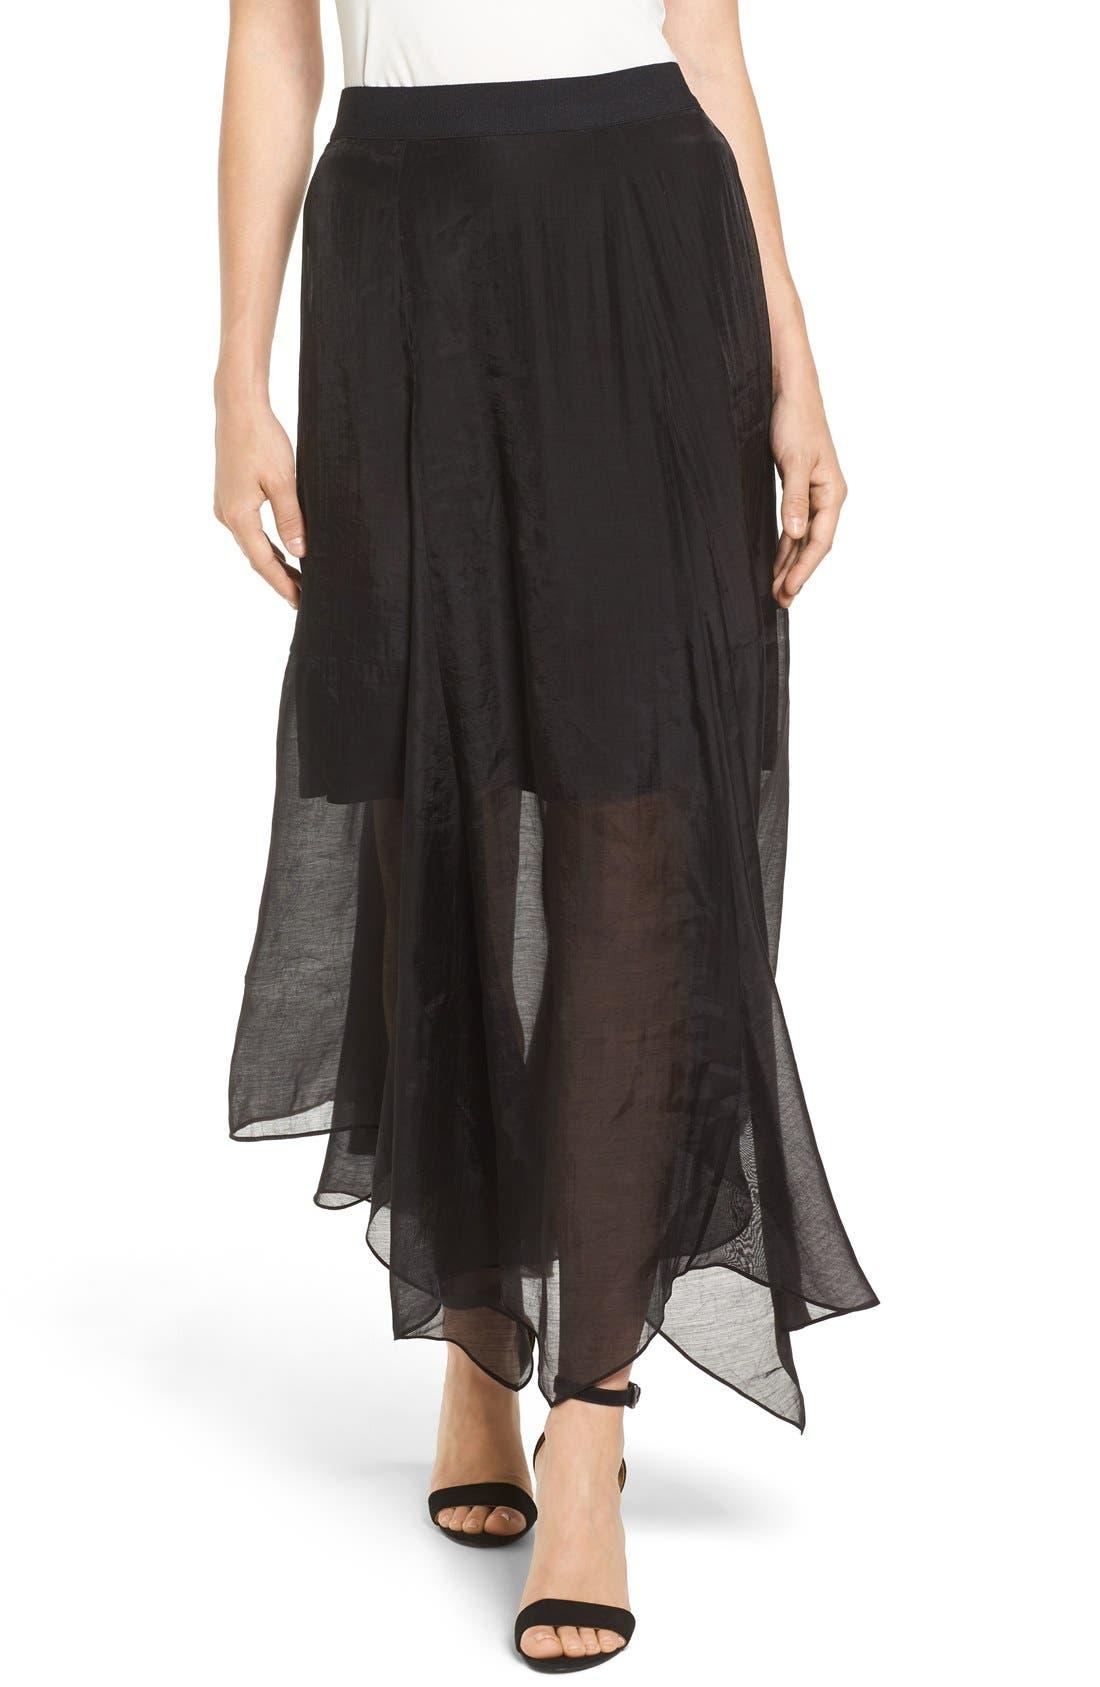 Batiste Party Skirt,                             Main thumbnail 1, color,                             004